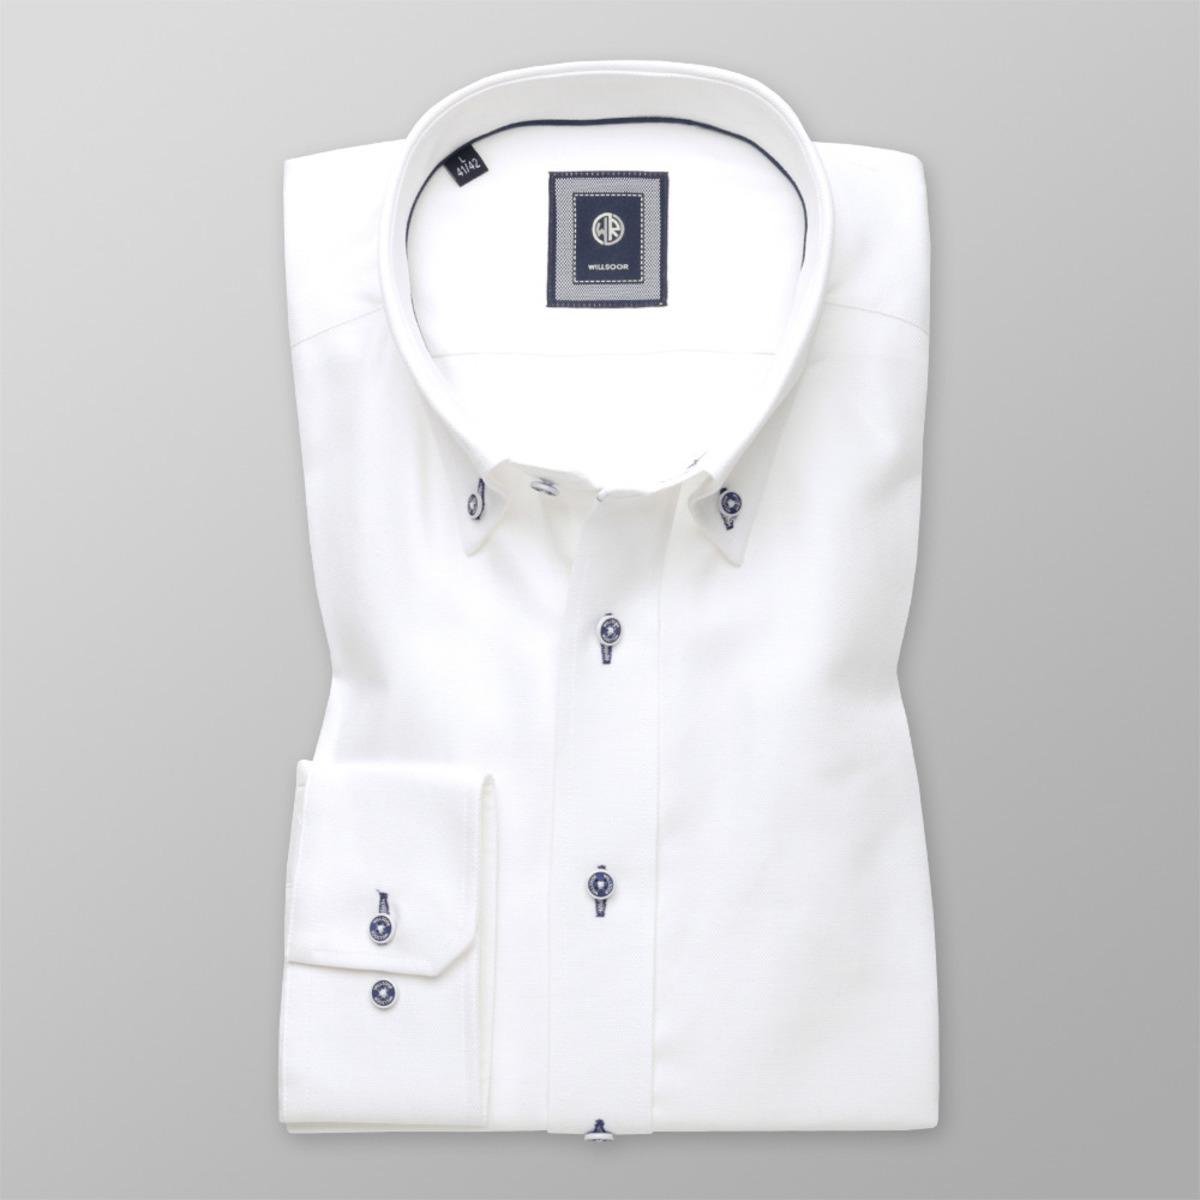 Bílá košile Slim Fit (výška 176-182 a 188-194) 9735 176-182 / L (41/42)